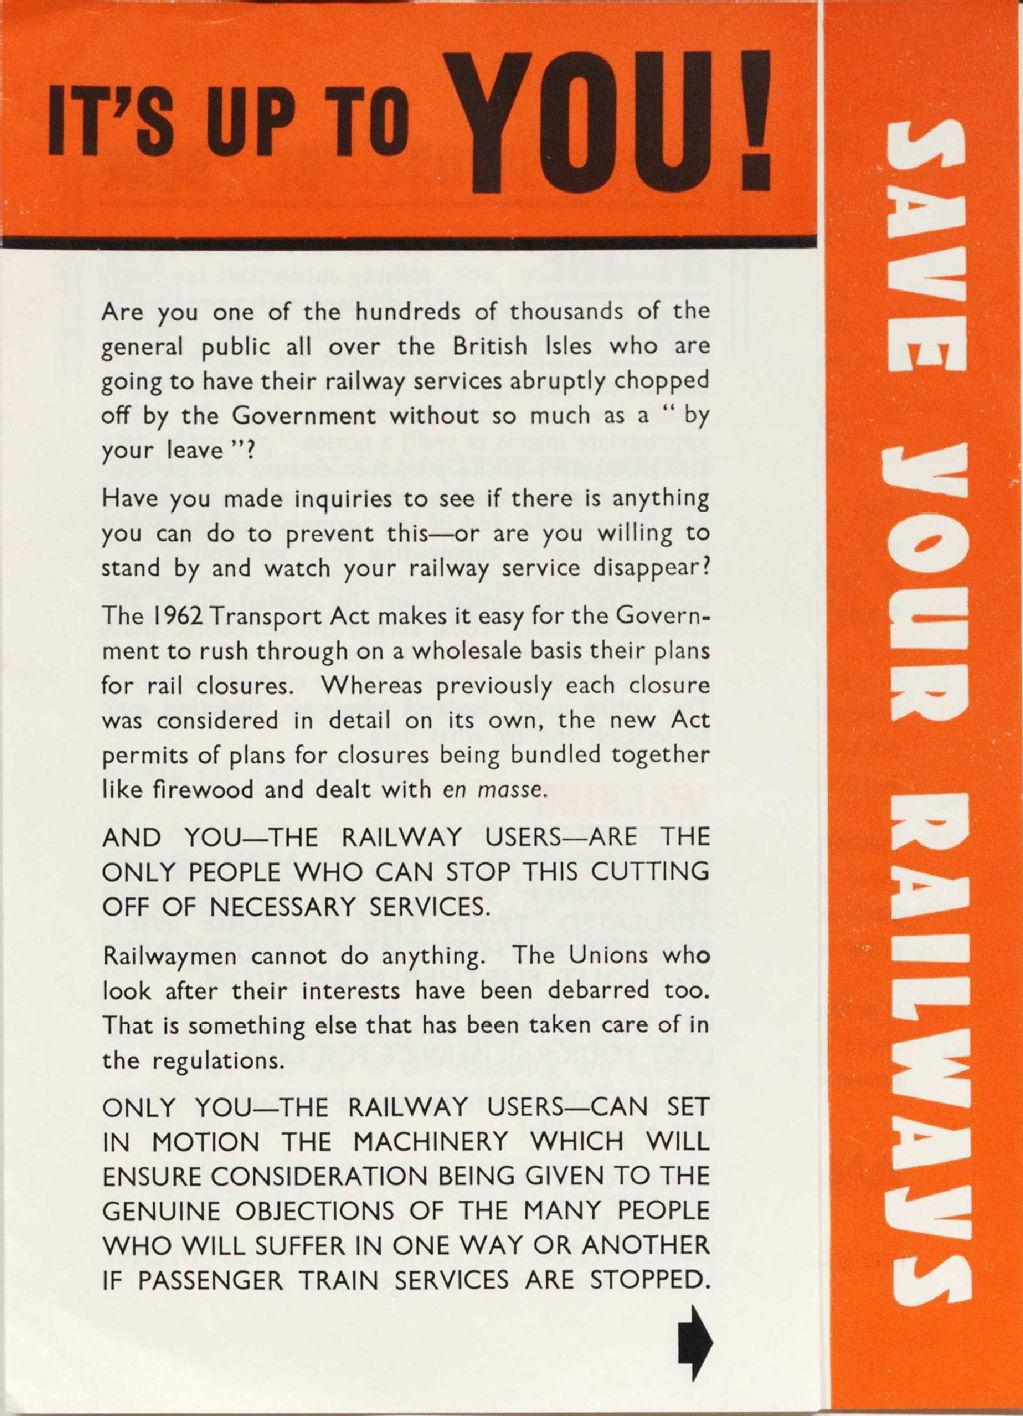 The National Union of Railwaymen, 1913-2013